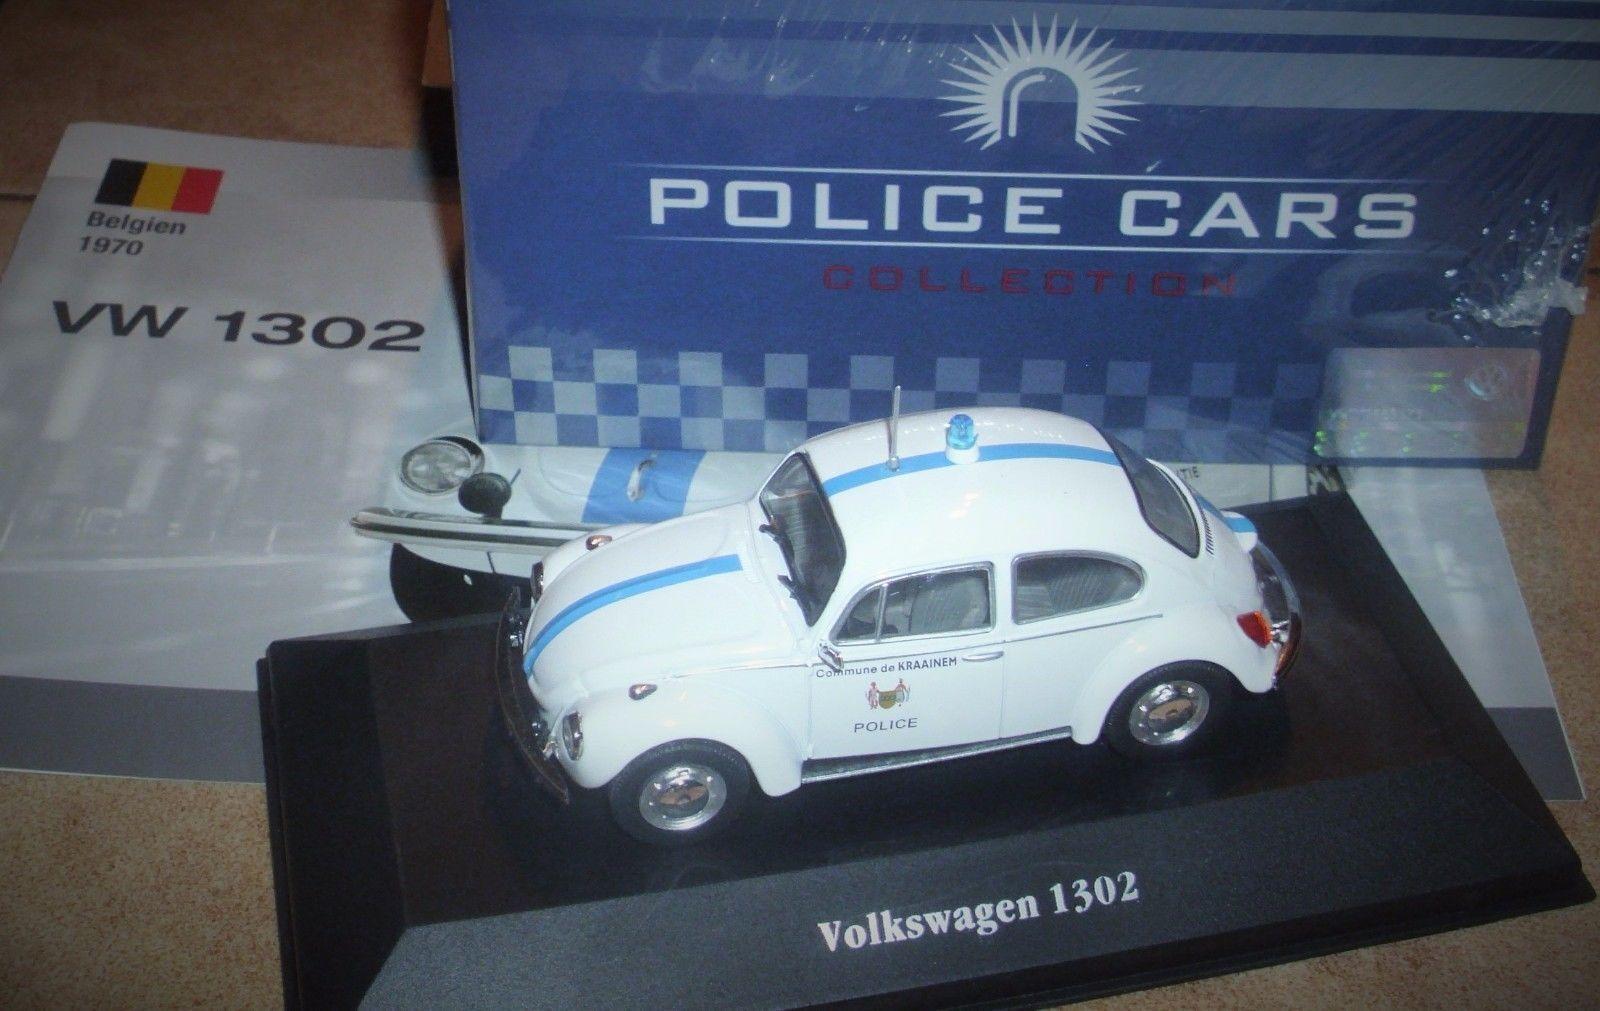 TOP TOP TOP NEU INOVP, VW 1302 - BELGIENSEHR Seltenes ModellEditions Atlas 3415f2